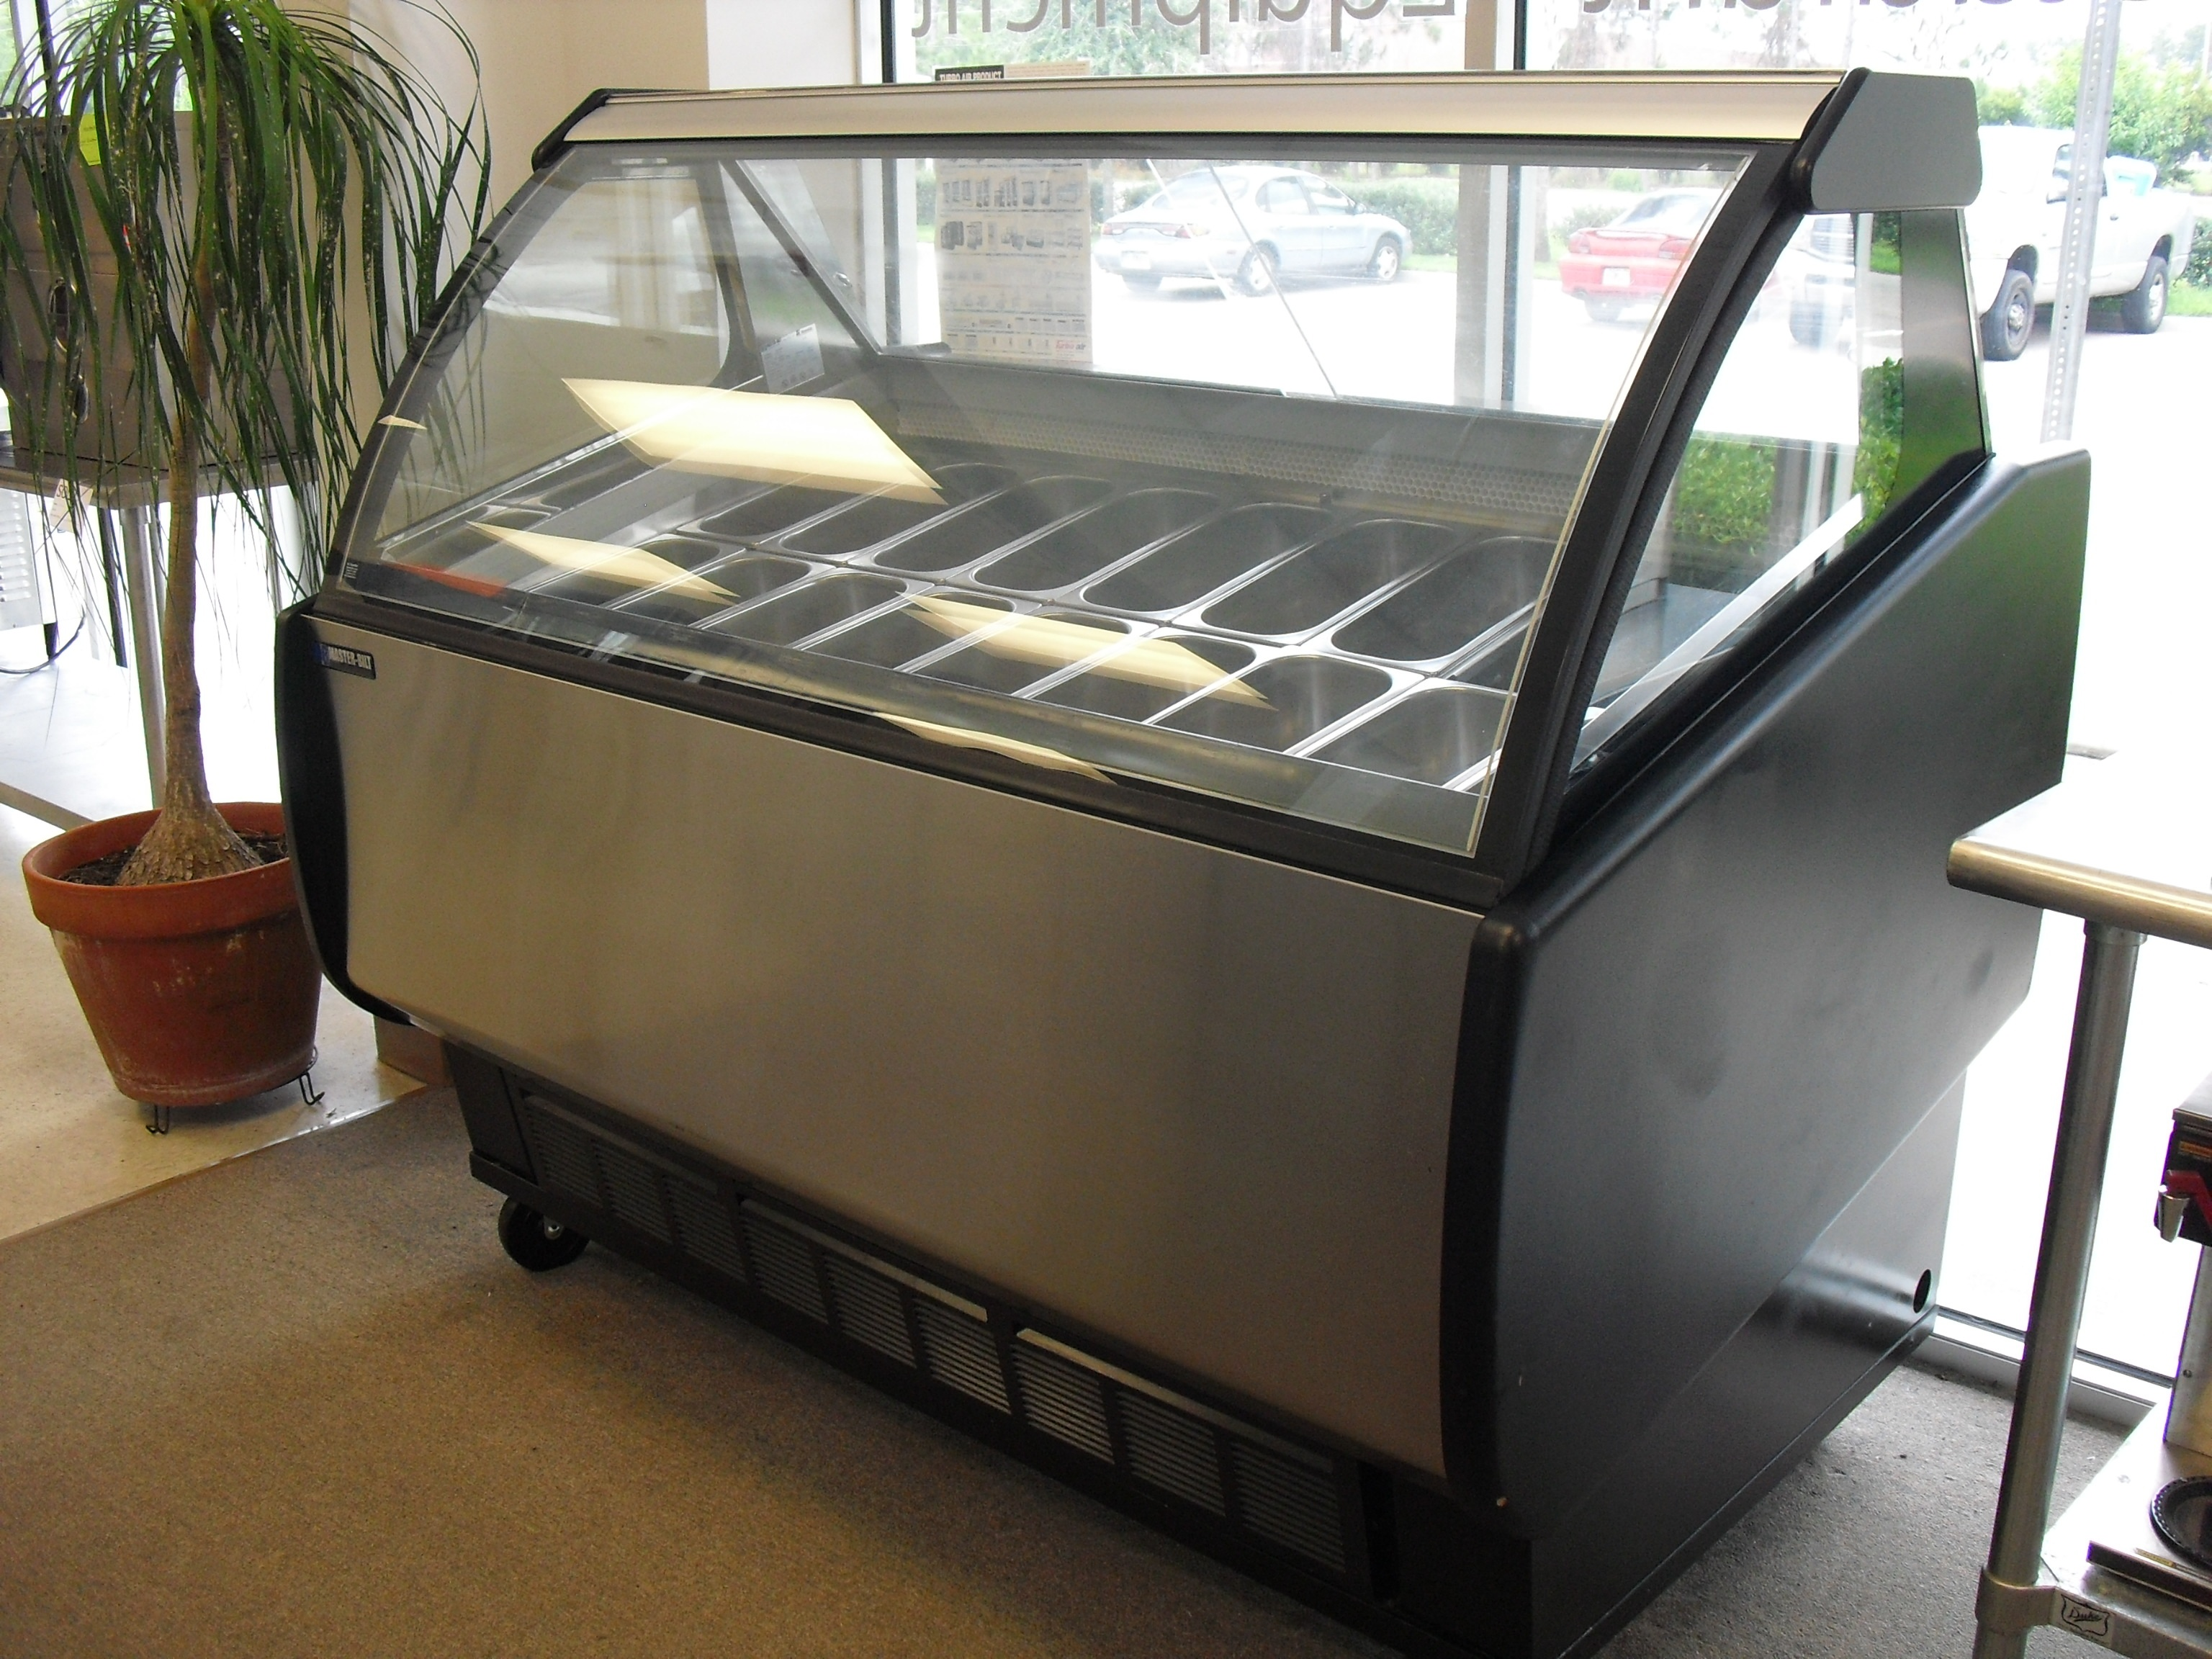 kitchen equipment for sale wood set fantastic gelato bakery  one fat frog